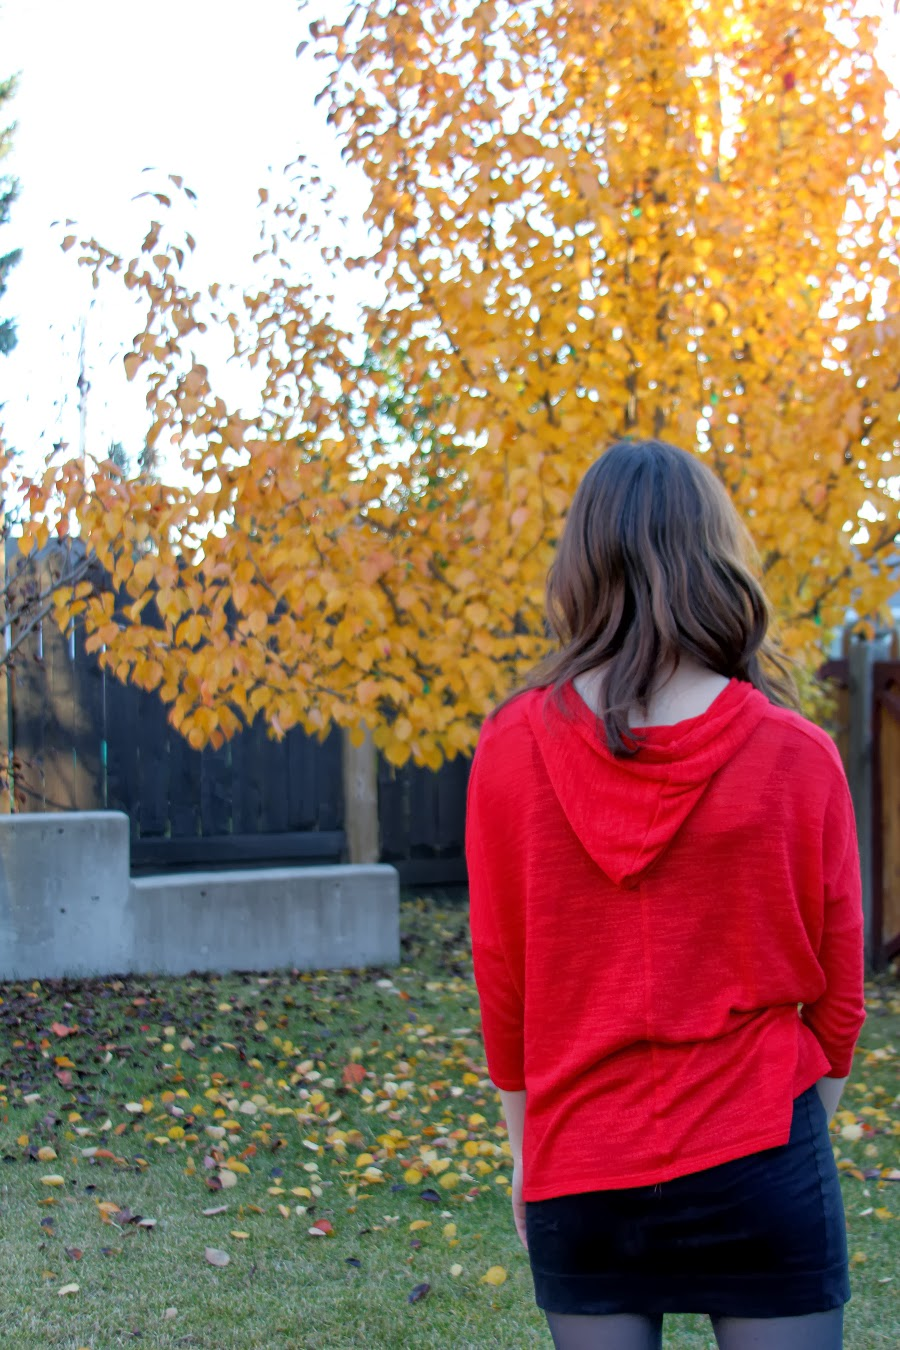 Halloween, Amy Pond, Doctor Who, costume, zara, H&M, red hoodie, vianni